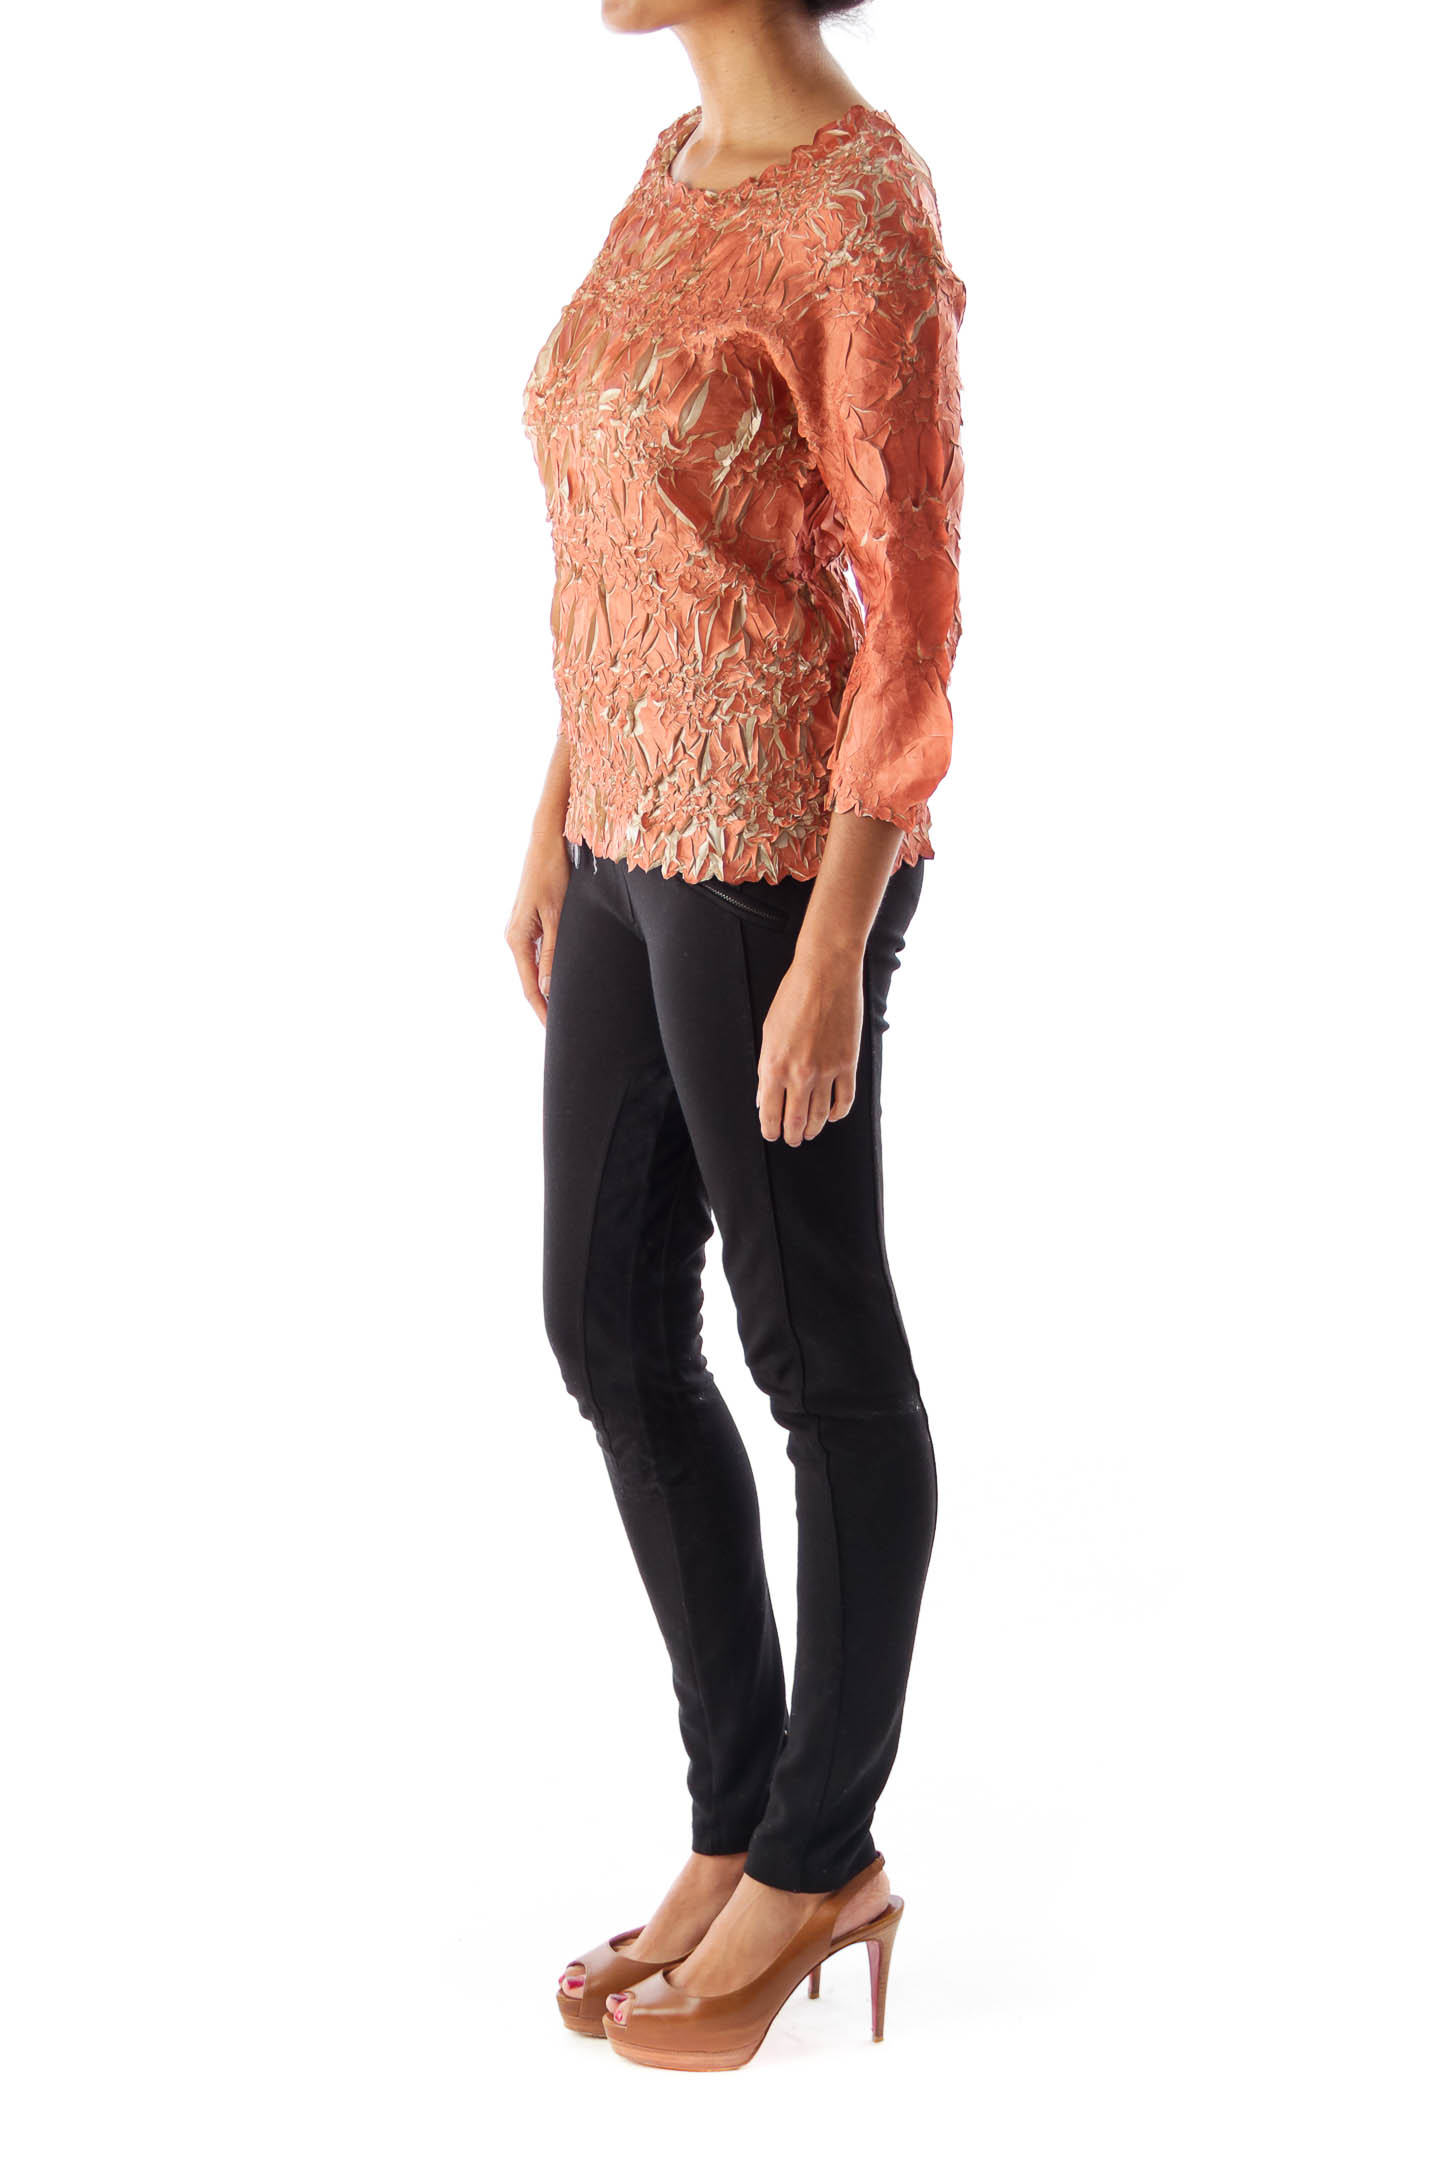 Brown Crinkle Stretch Shirt